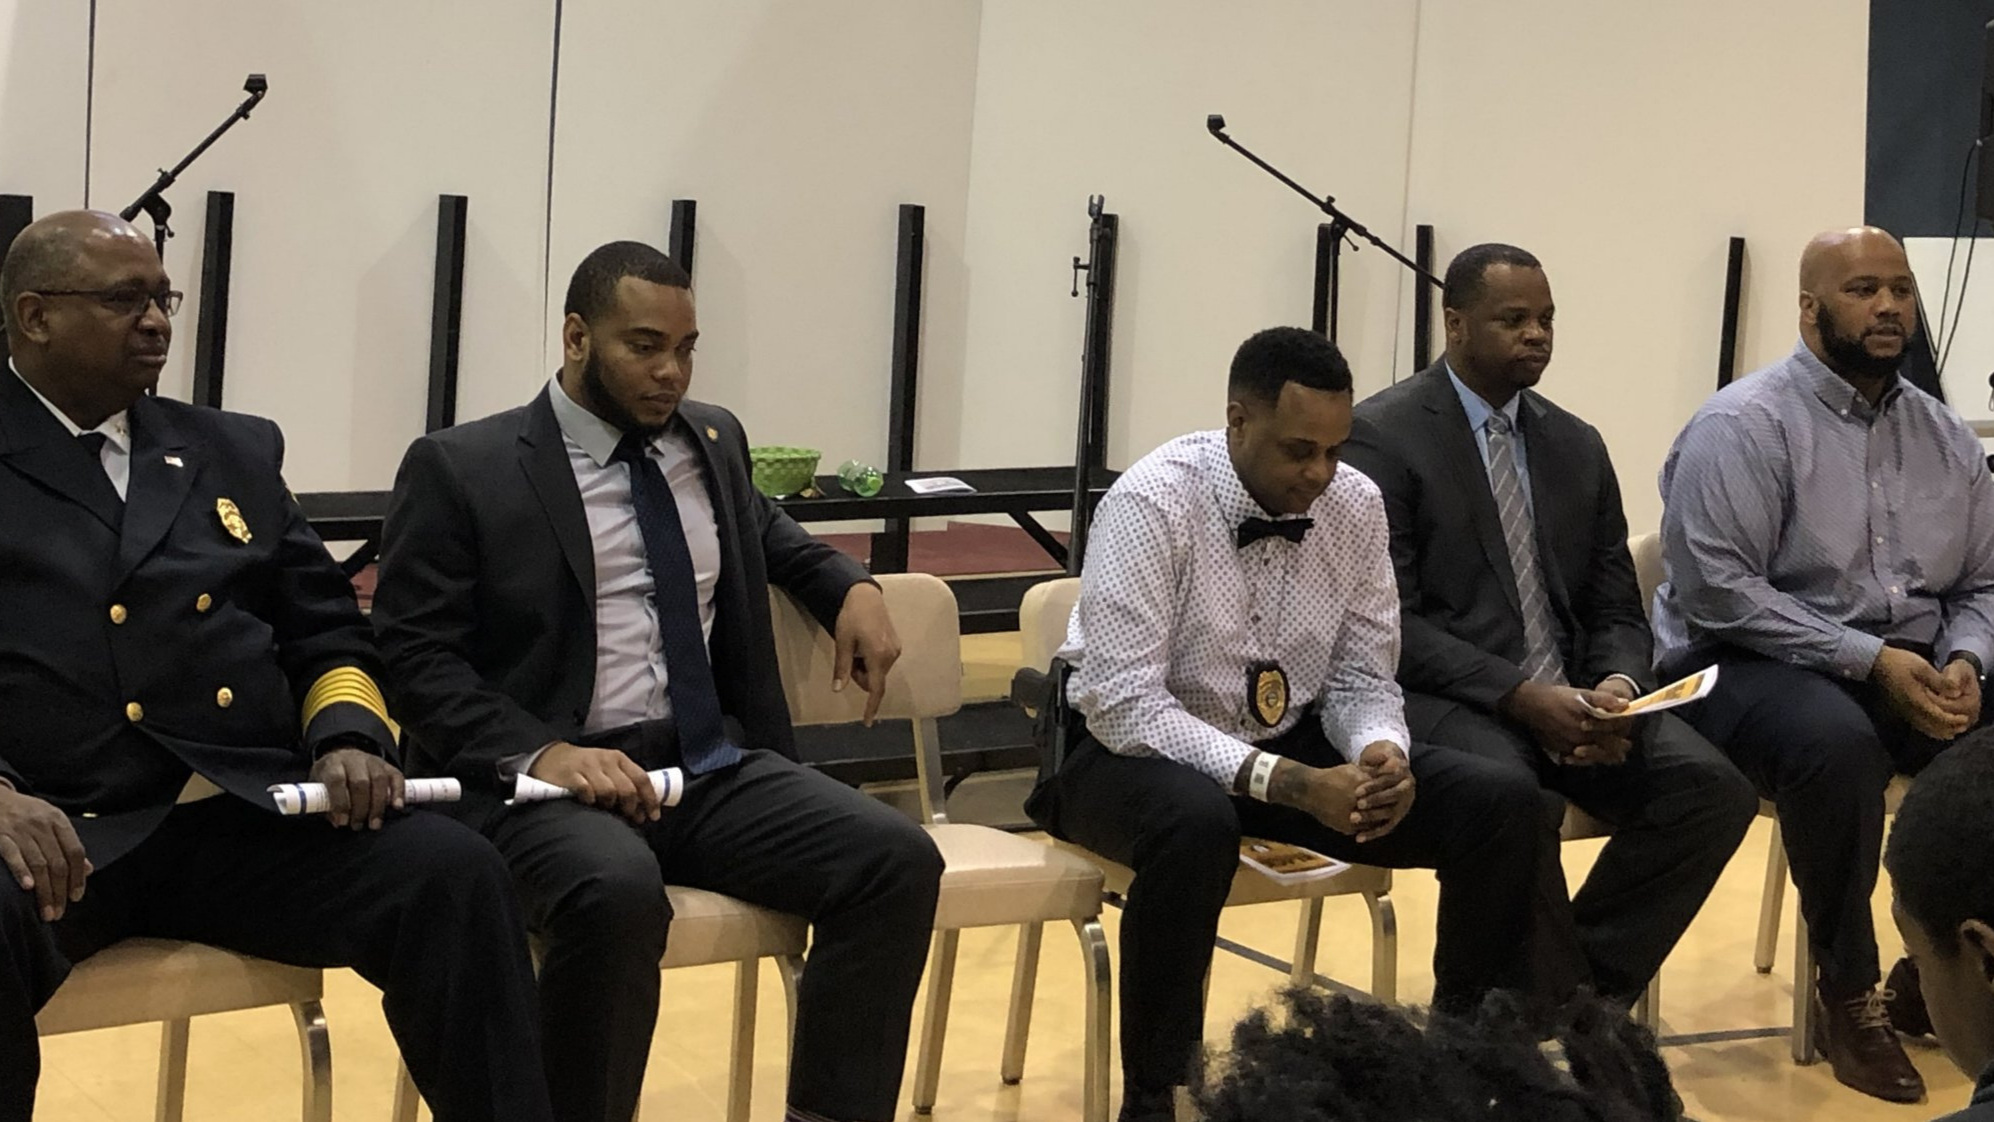 From left: Chief Clarence Tucker, David Hamilton, Detective Jon Morgan, Reggie Ray, Larry Burt